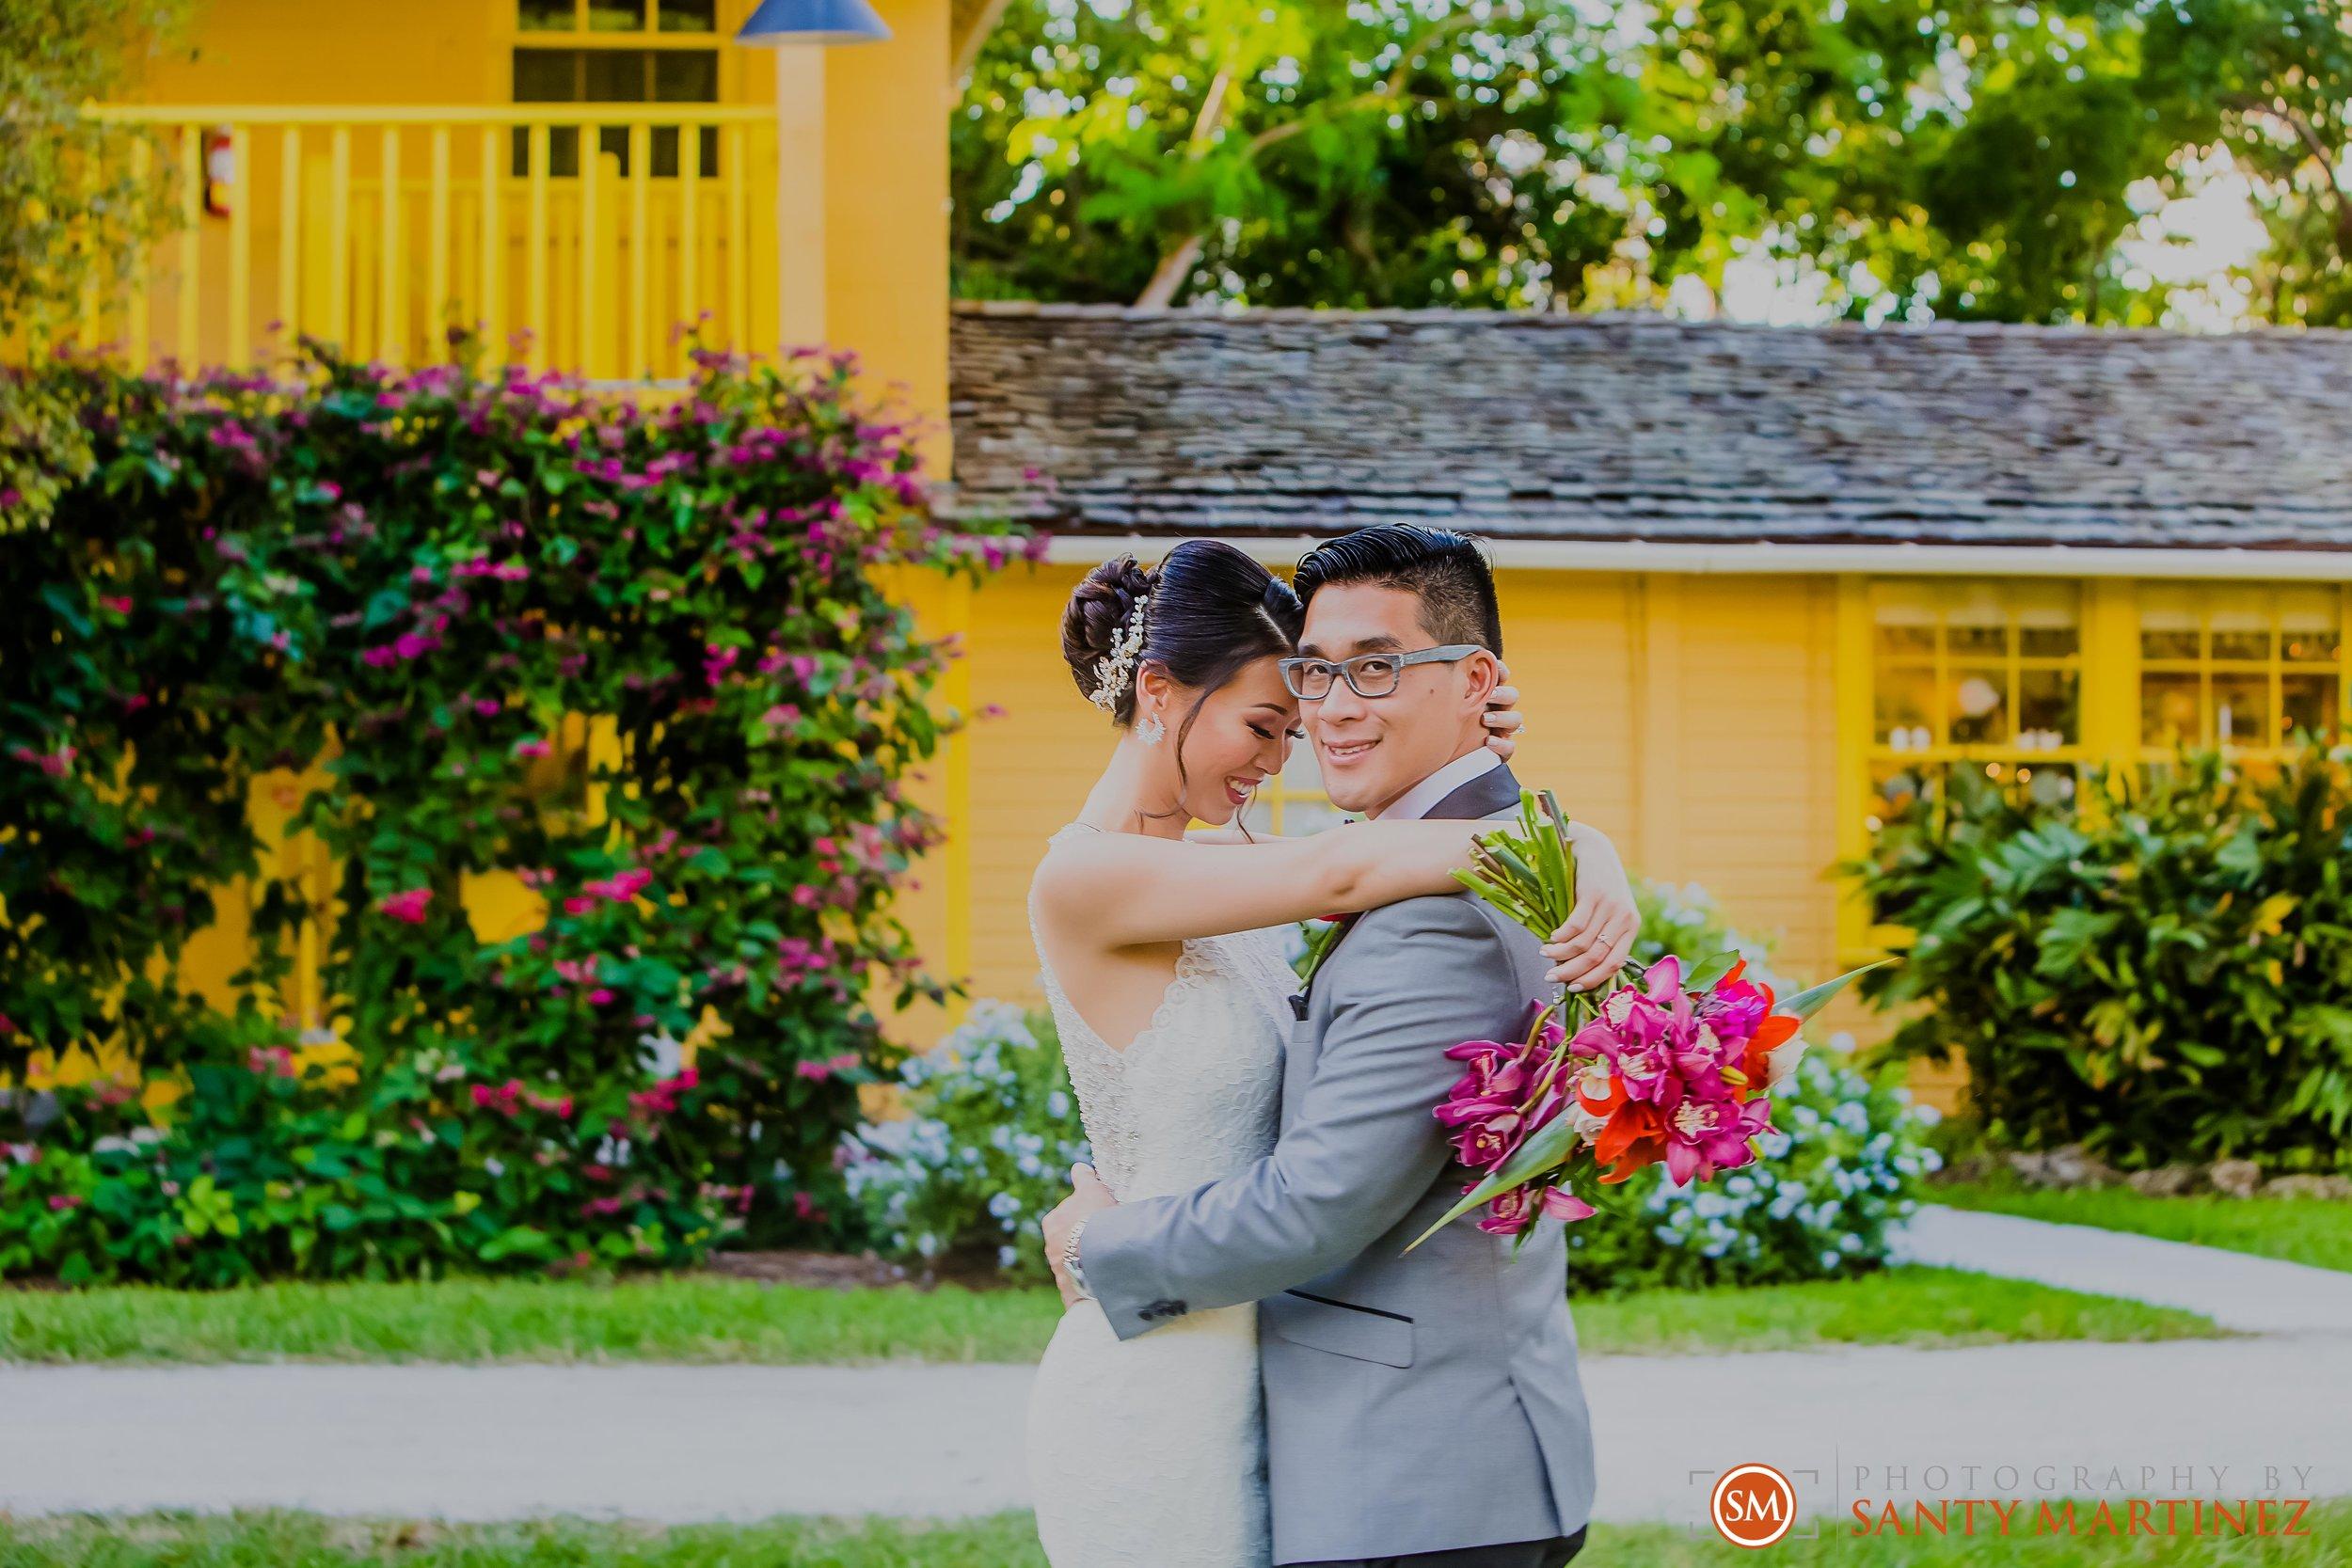 Wedding Bonnet House - Photography by Santy Martinez-20.jpg